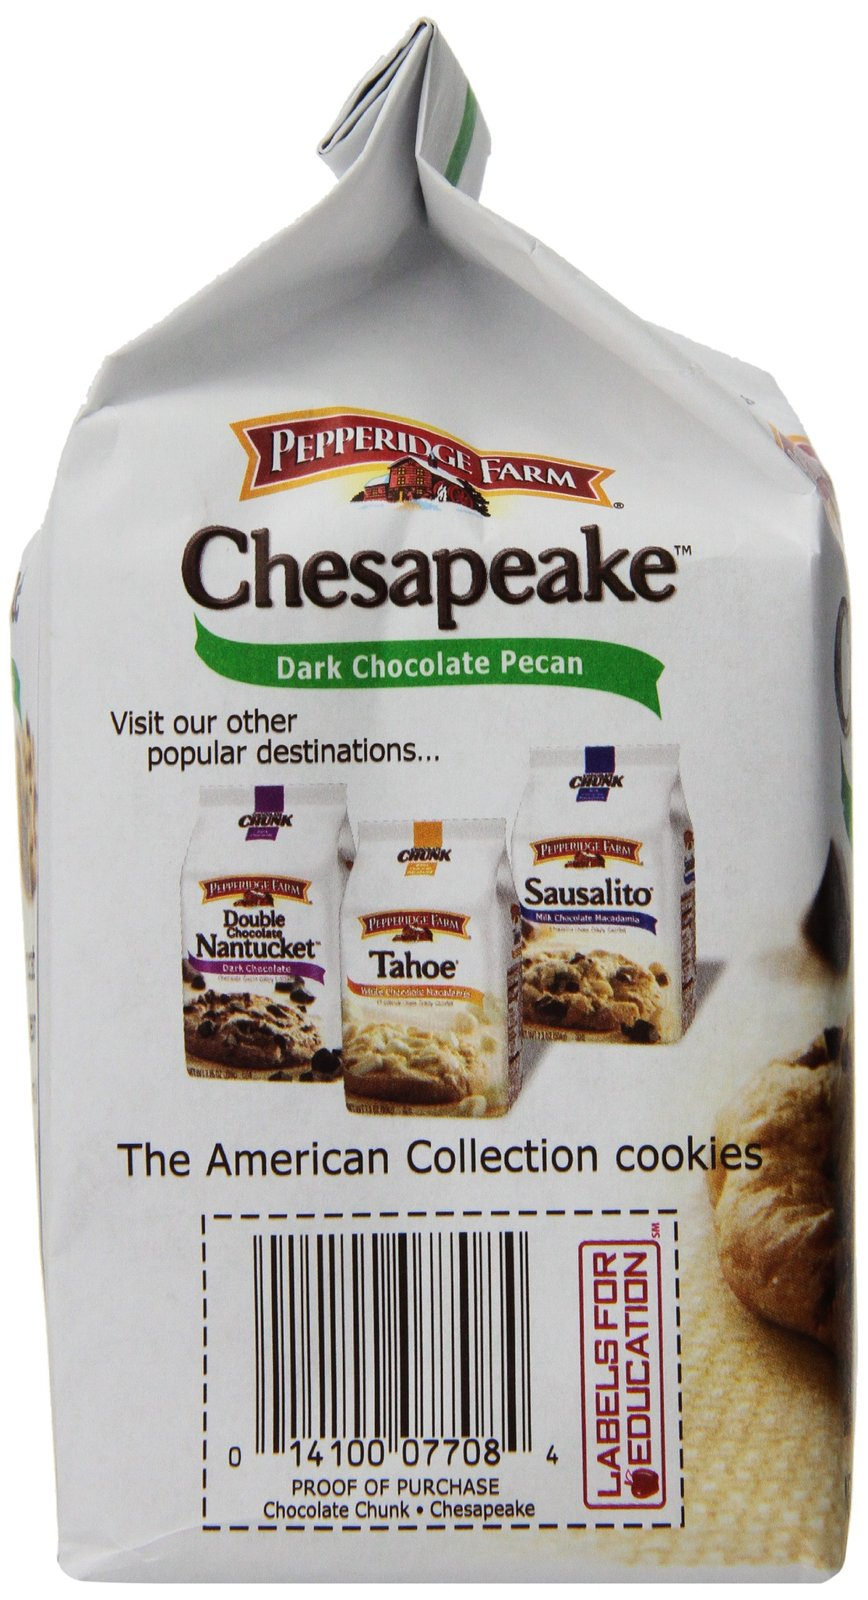 Pepperidge Farm Chesapeake, Crispy, Cookies, Dark Chocolate Pecan, 7.2 oz, Bag,  image 7